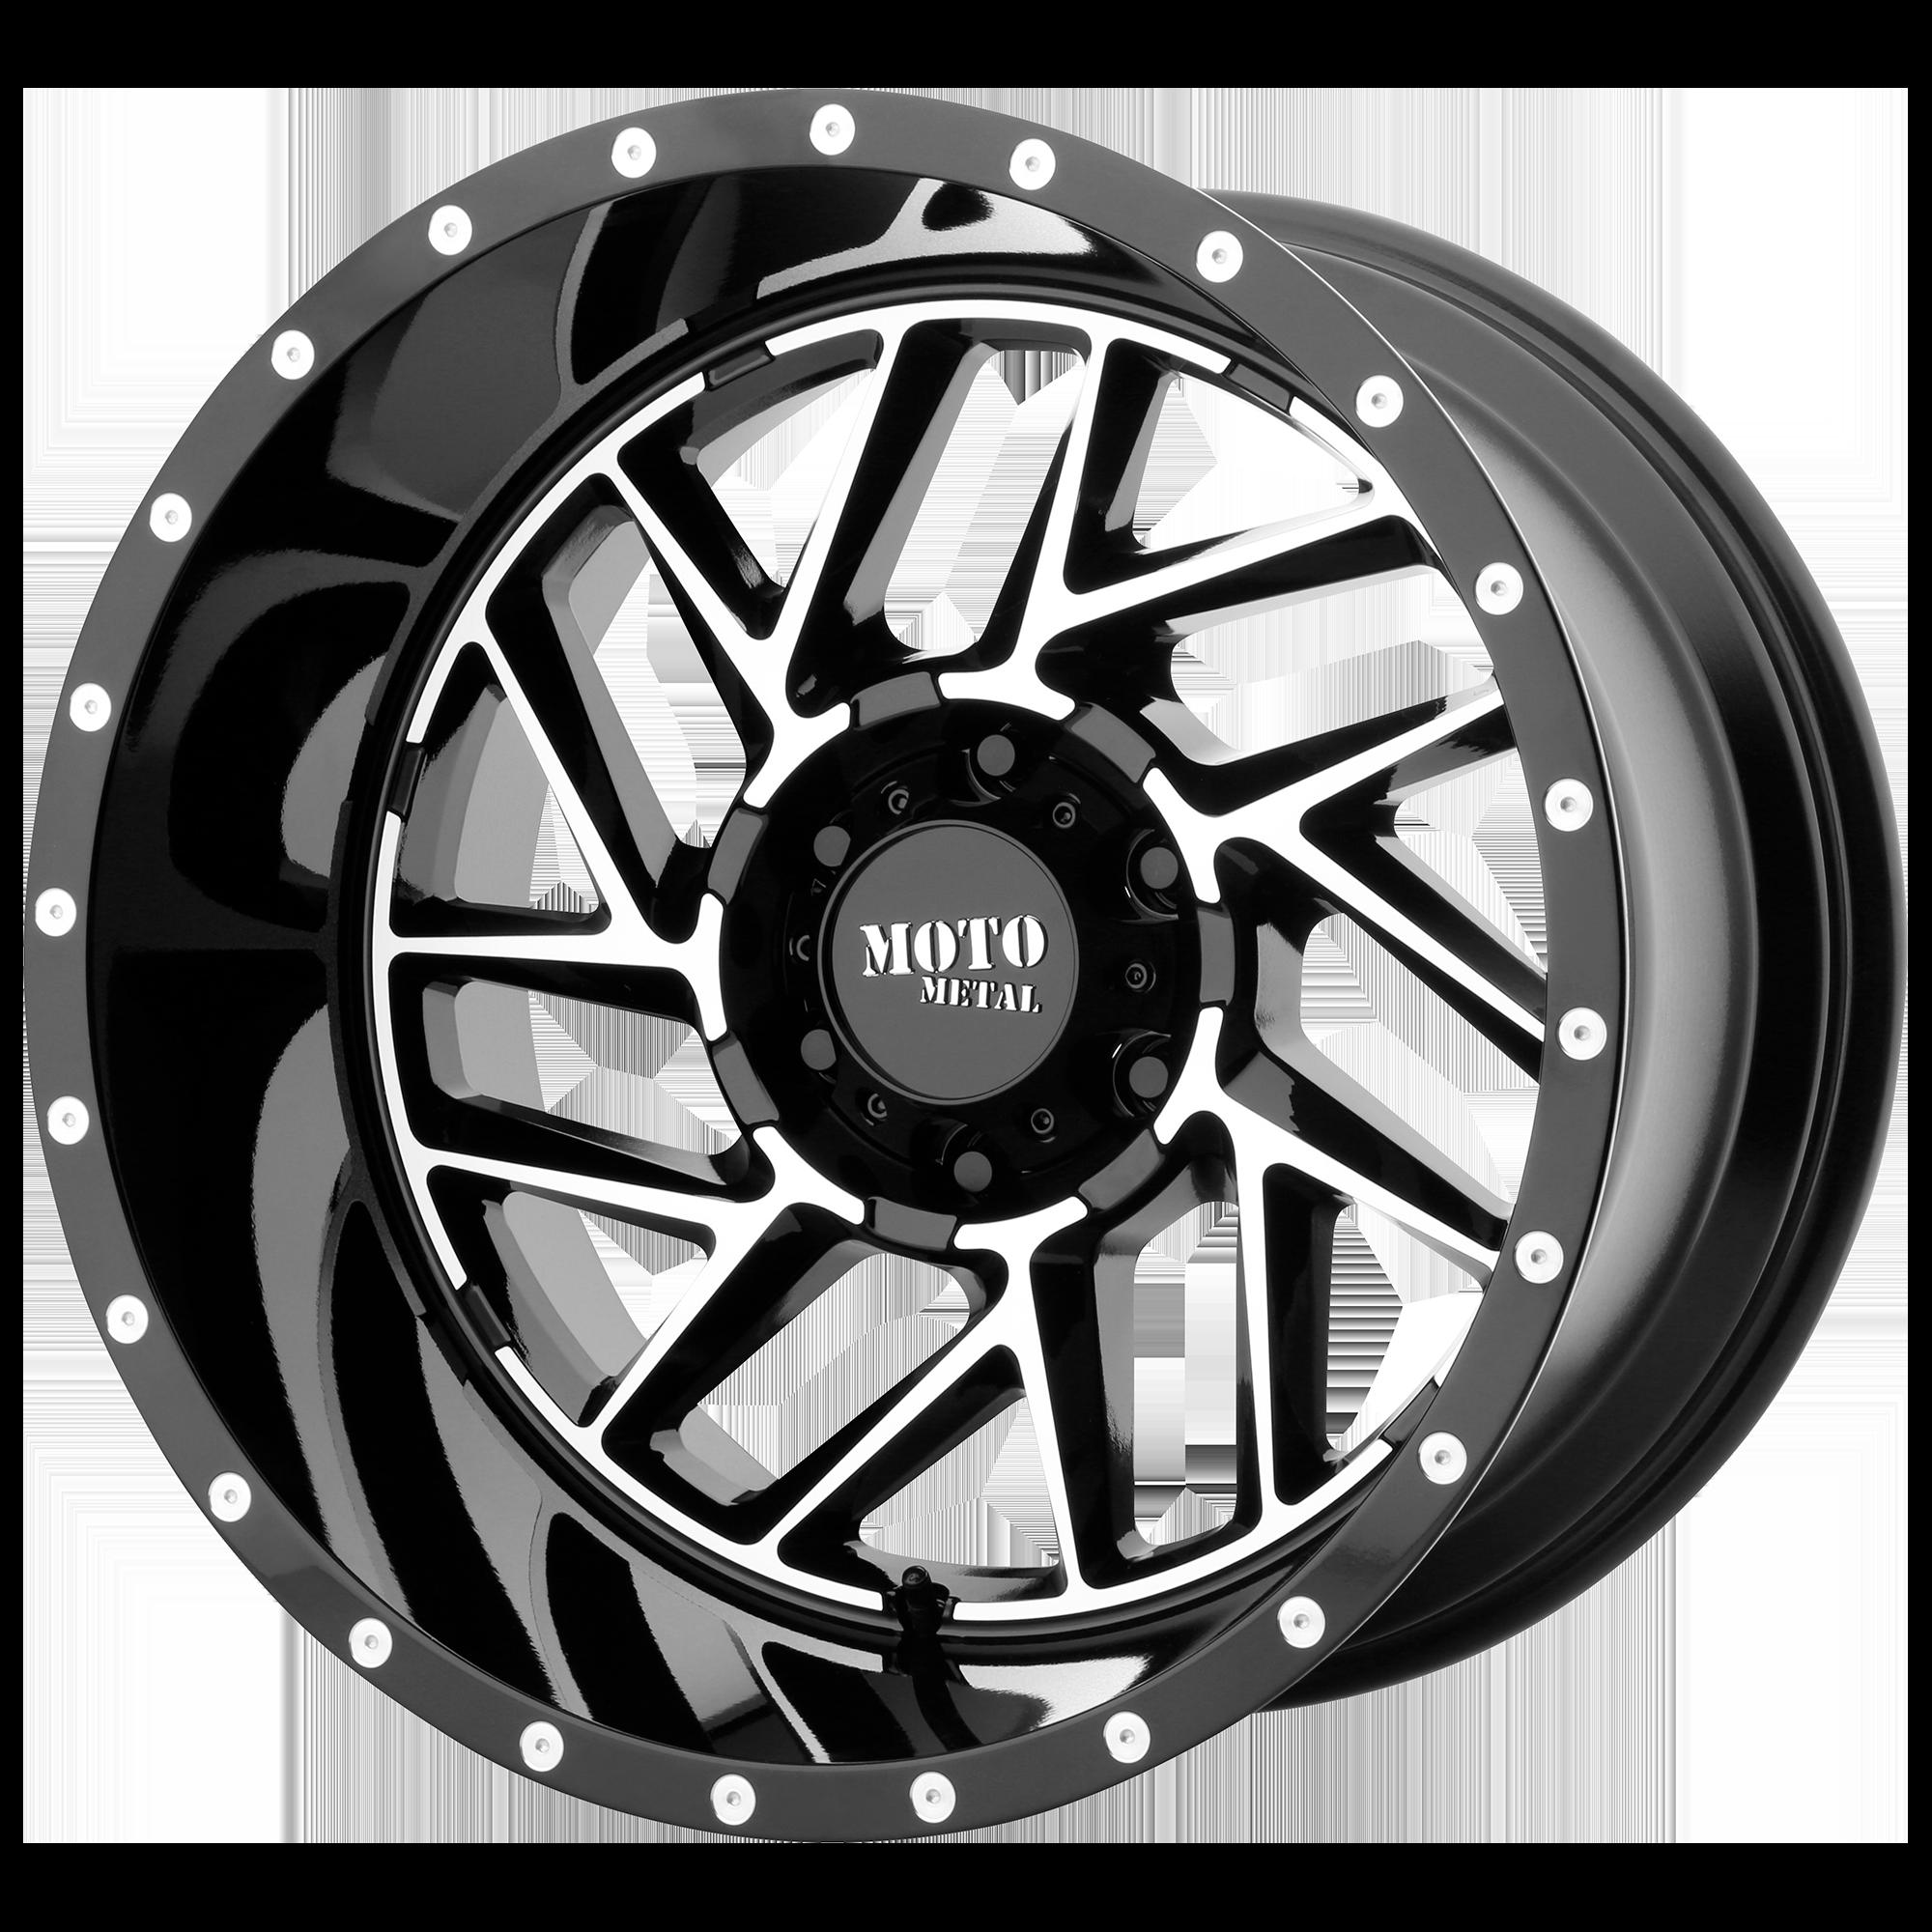 MOTO METAL MO985 BREAKOUT hliníkové disky 9x20 8x170 ET18 Gloss Black Machined